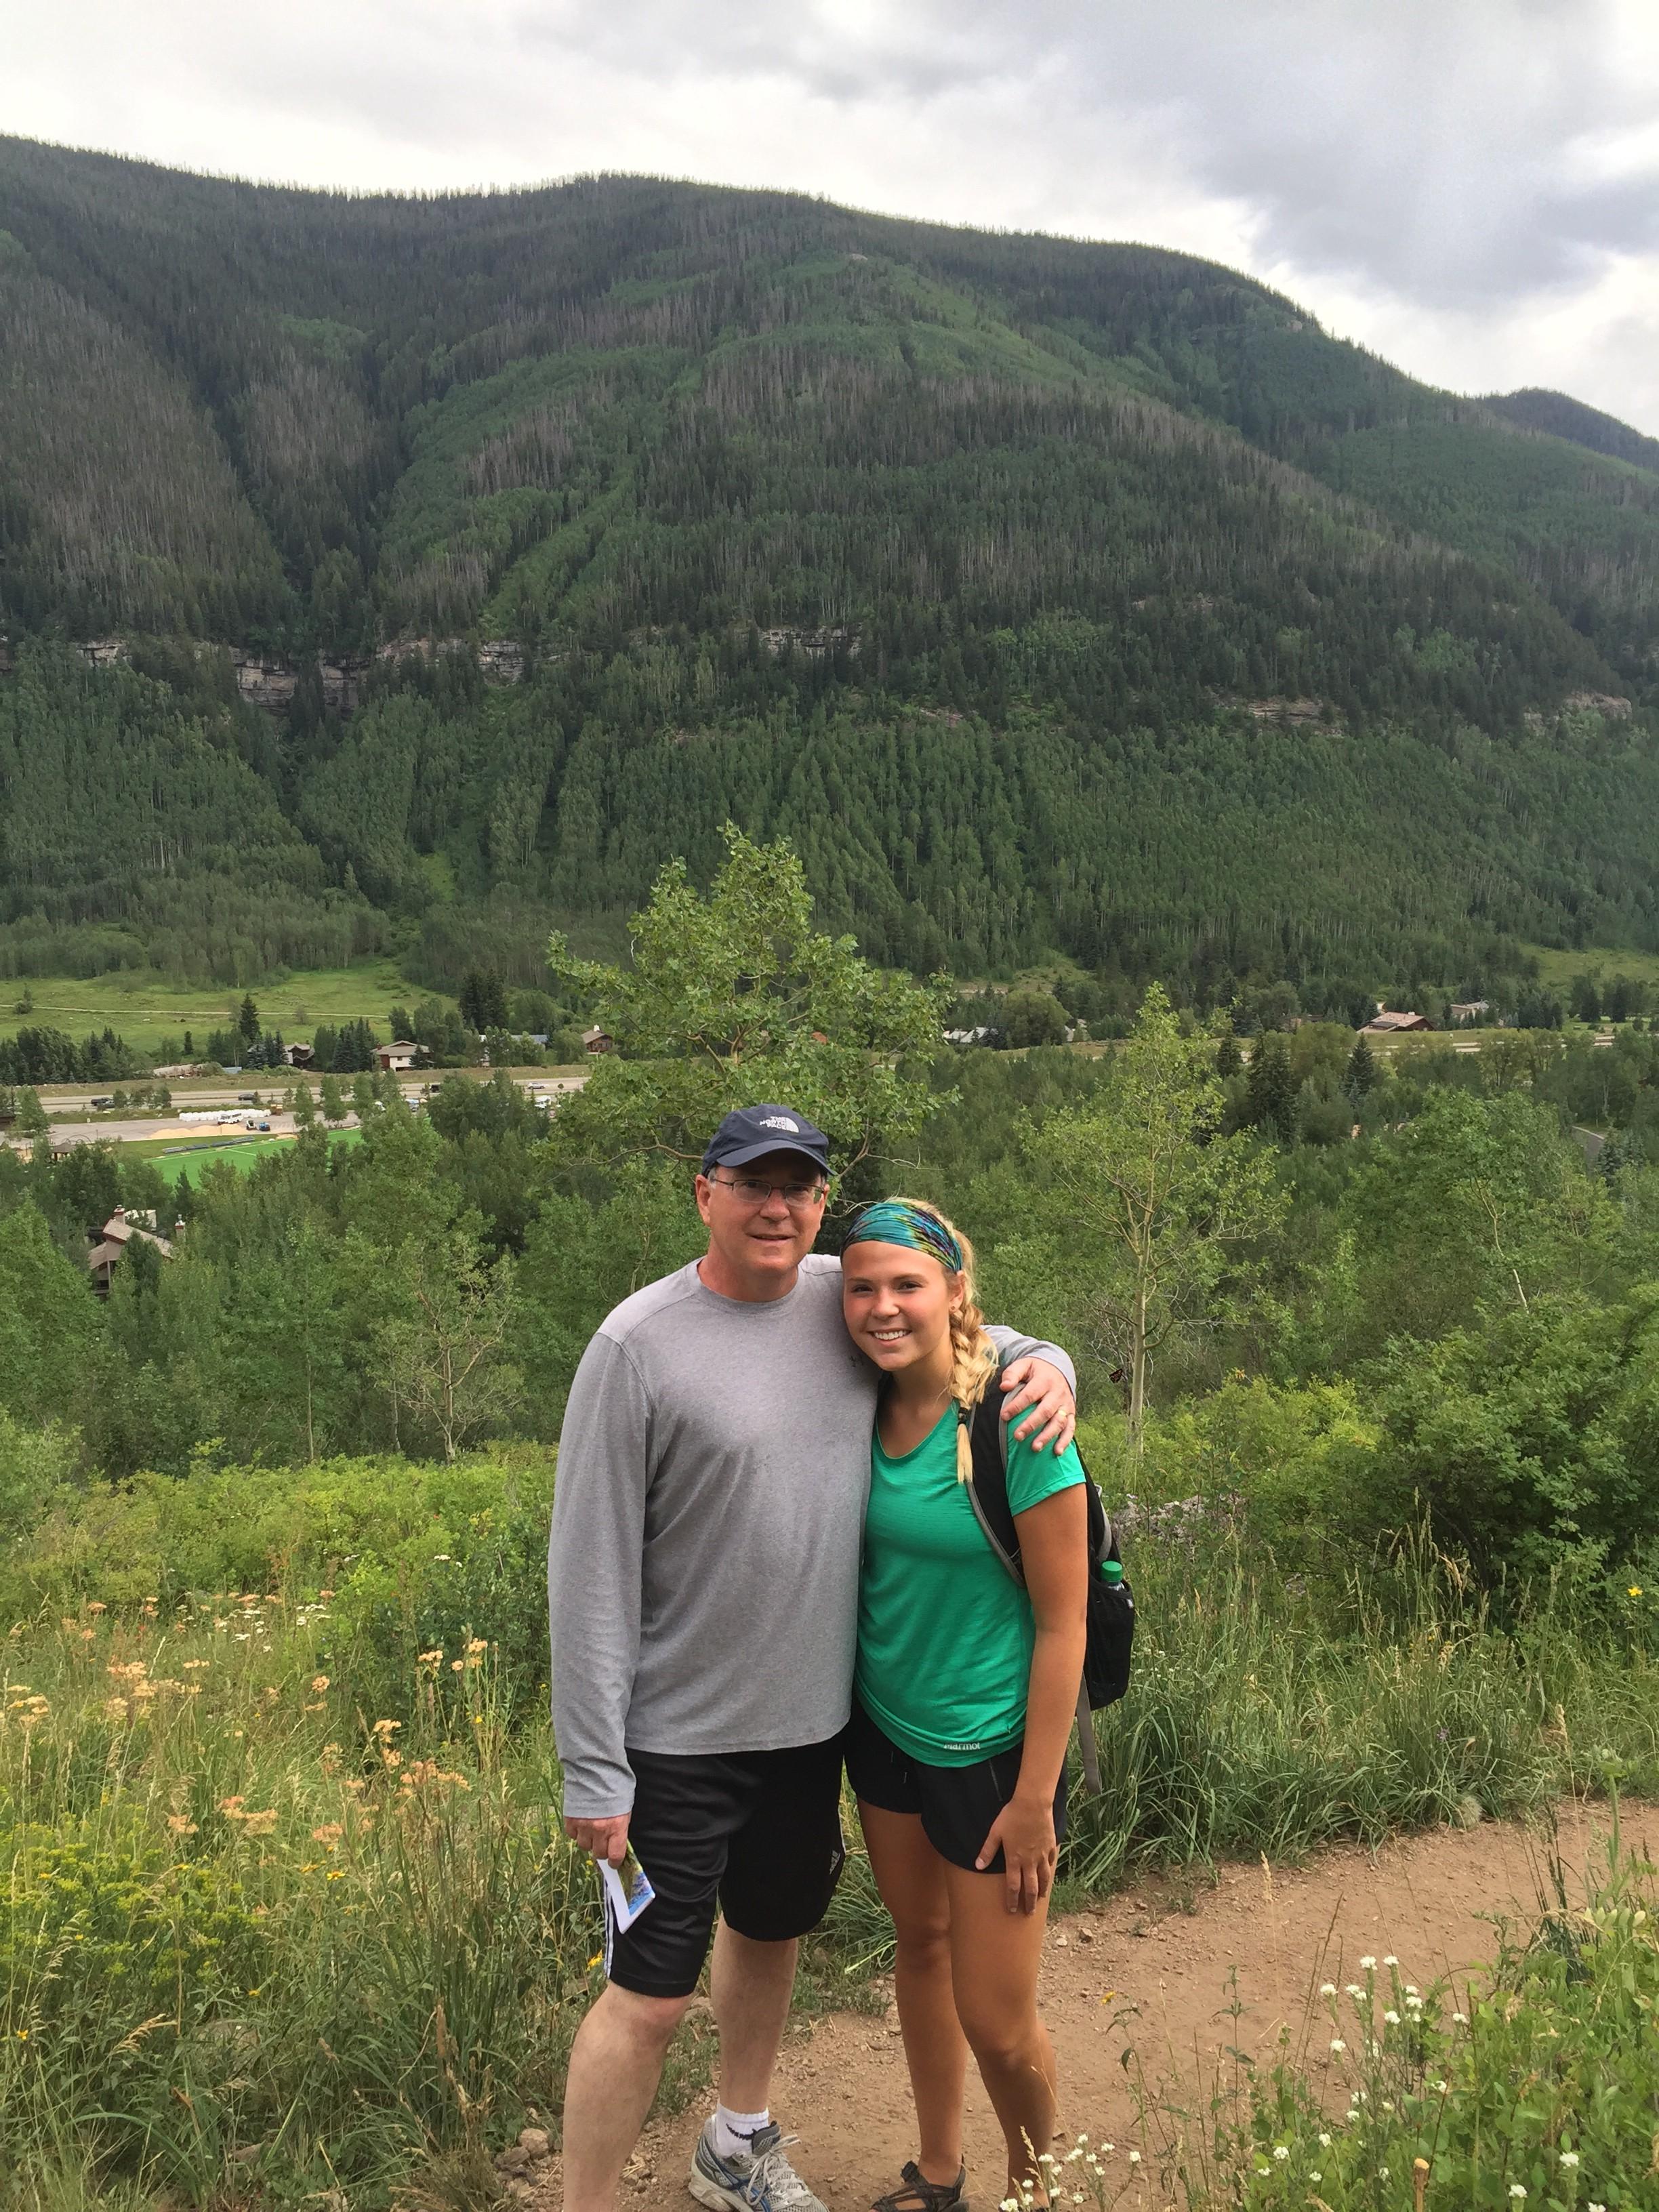 Taylor Jones: Exploring the Rockies